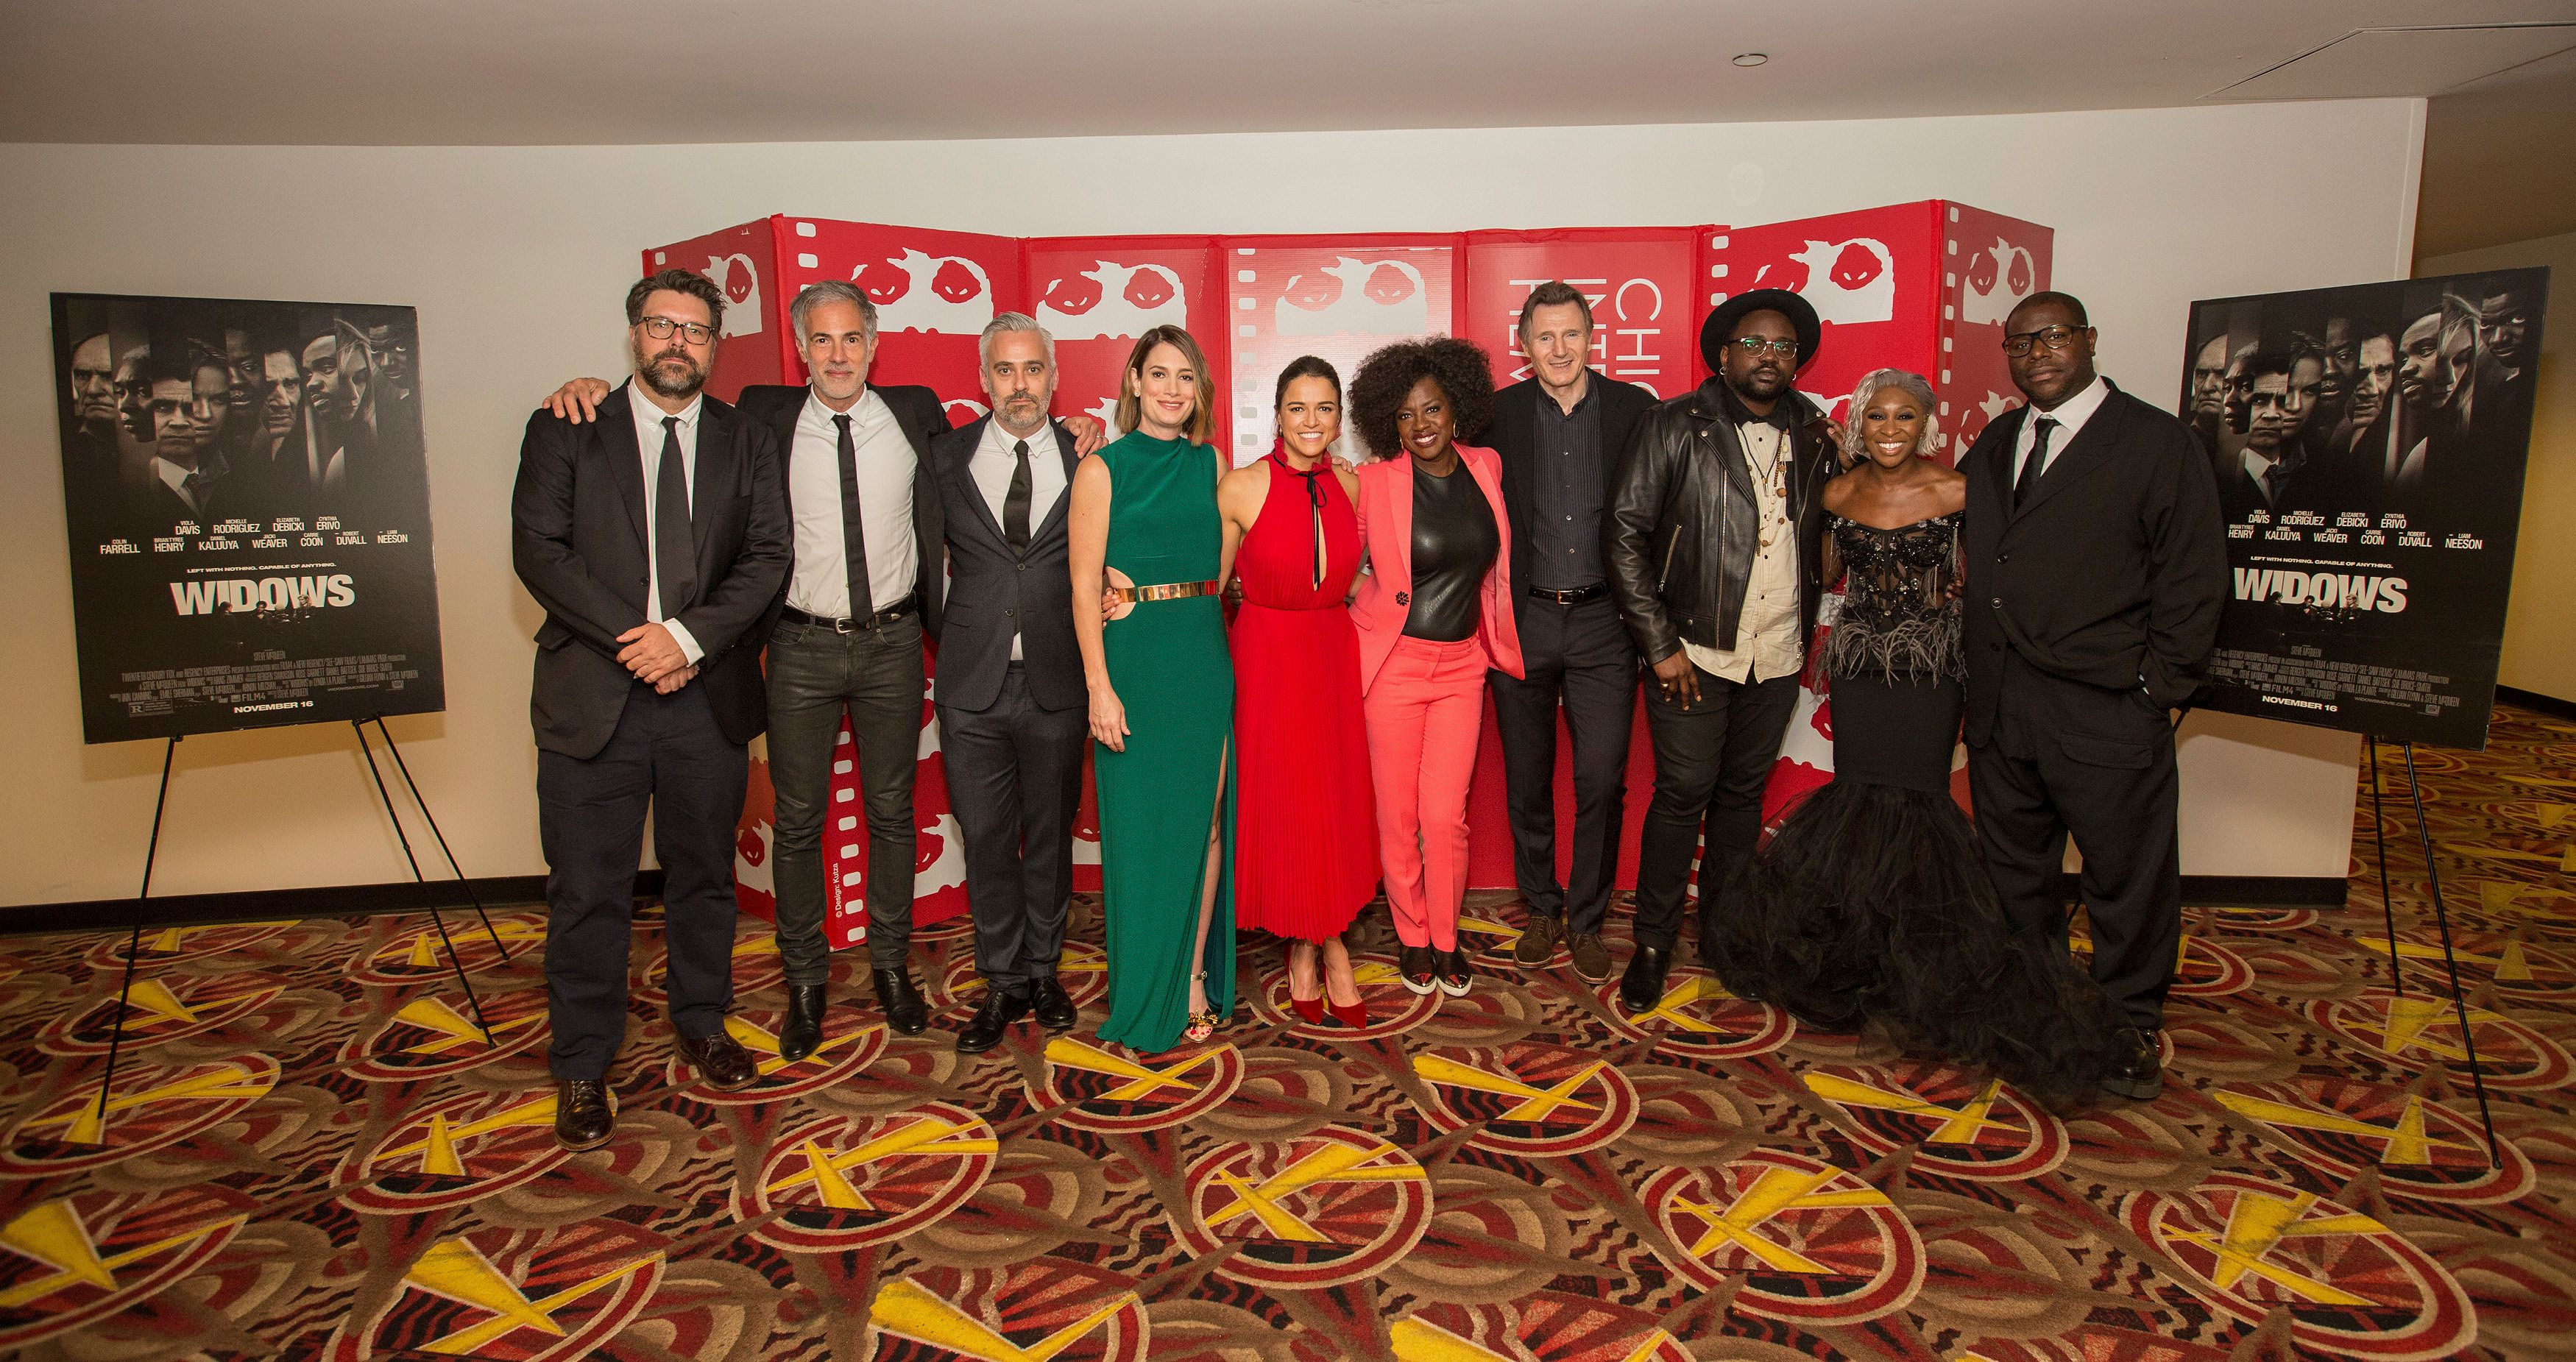 Michelle Rodriguez starred alongside Liam Neeson and Viola Davis in